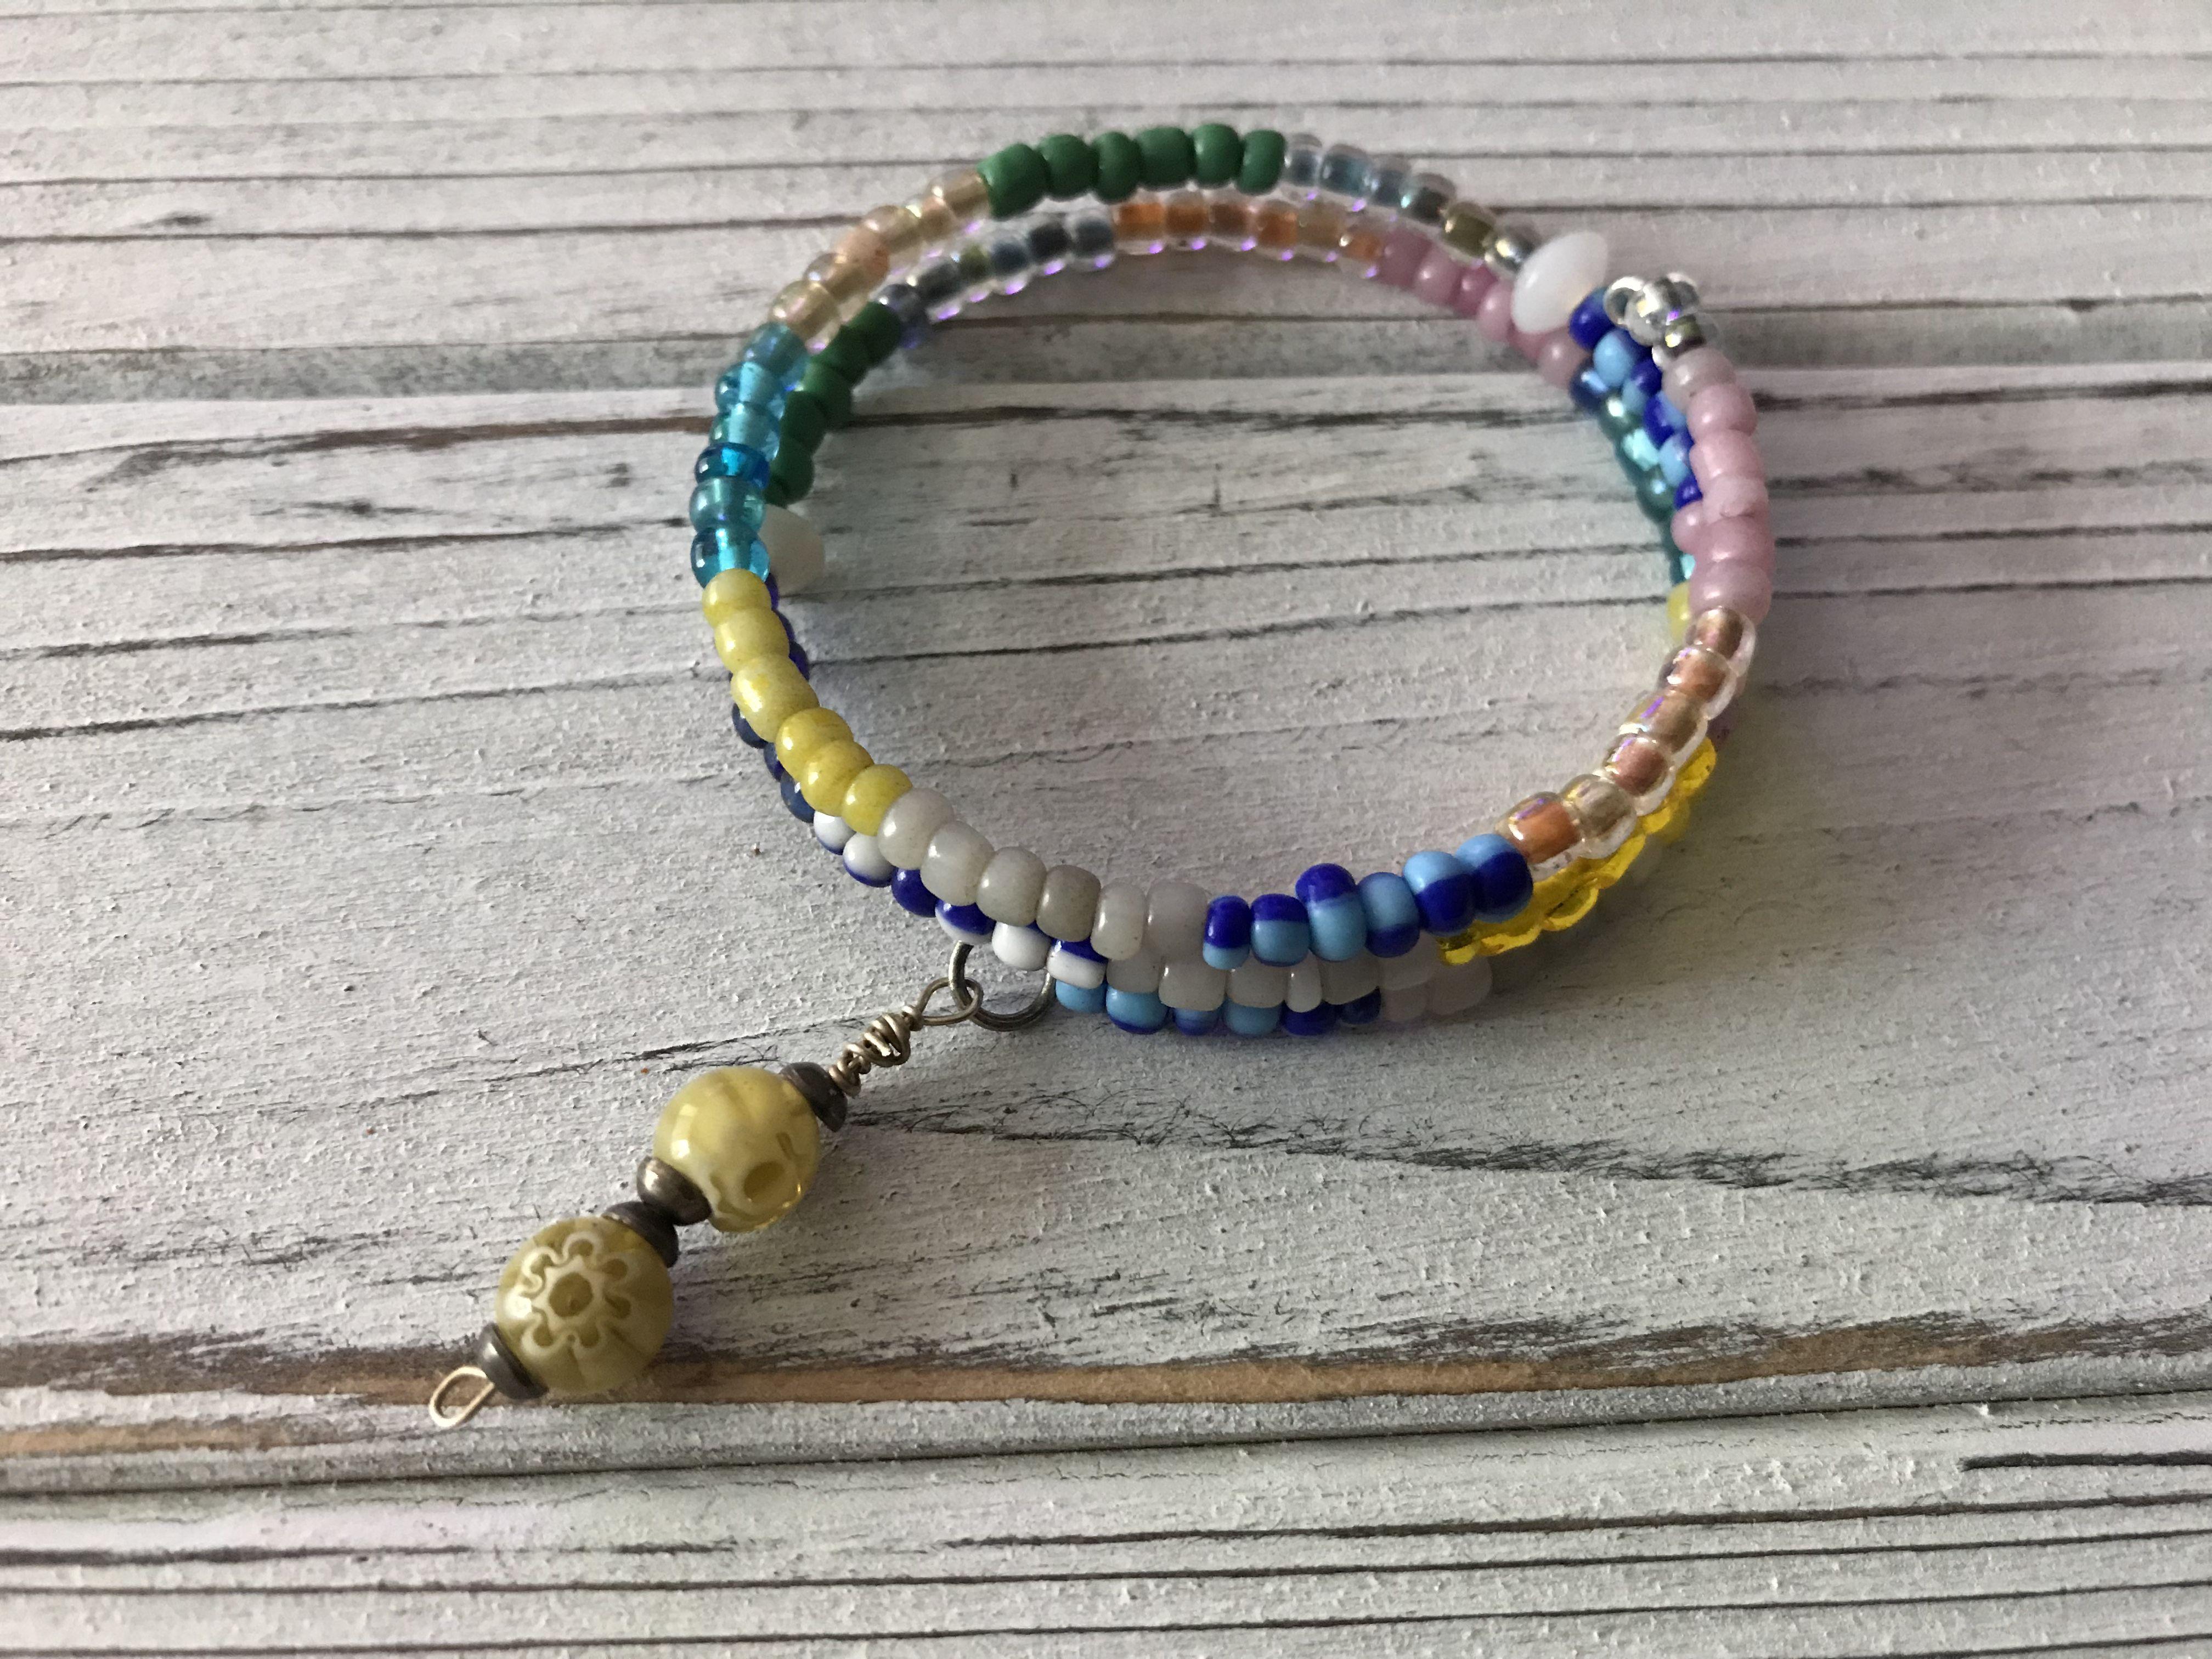 unique wrapbracelet naturalstones allcolors wirewrap handmade stylish glassbeads giftsforall